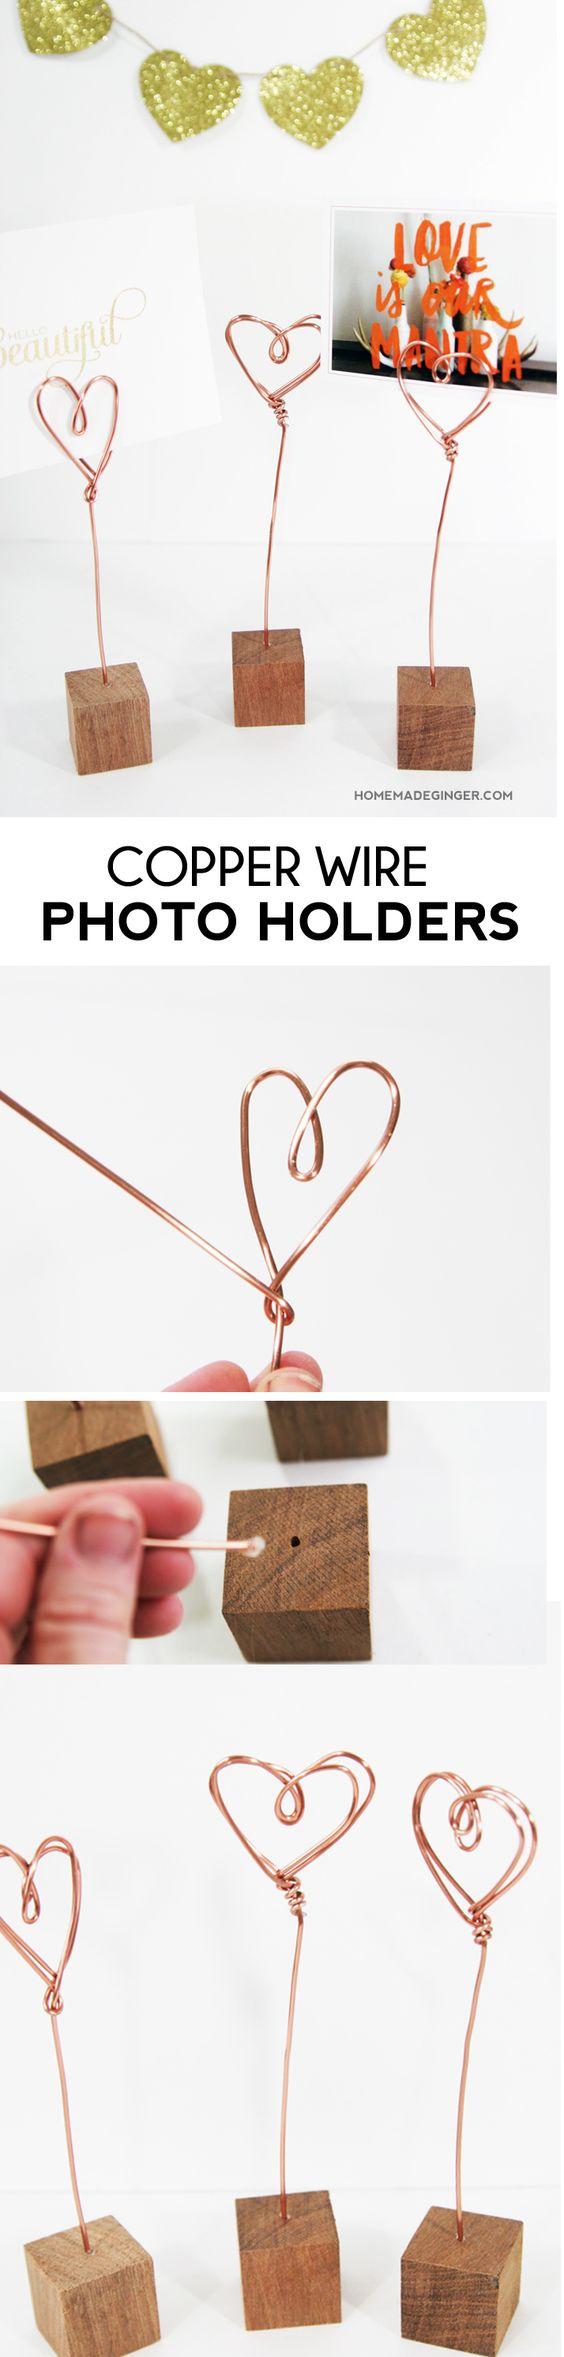 Copper Wire Photo Holders.